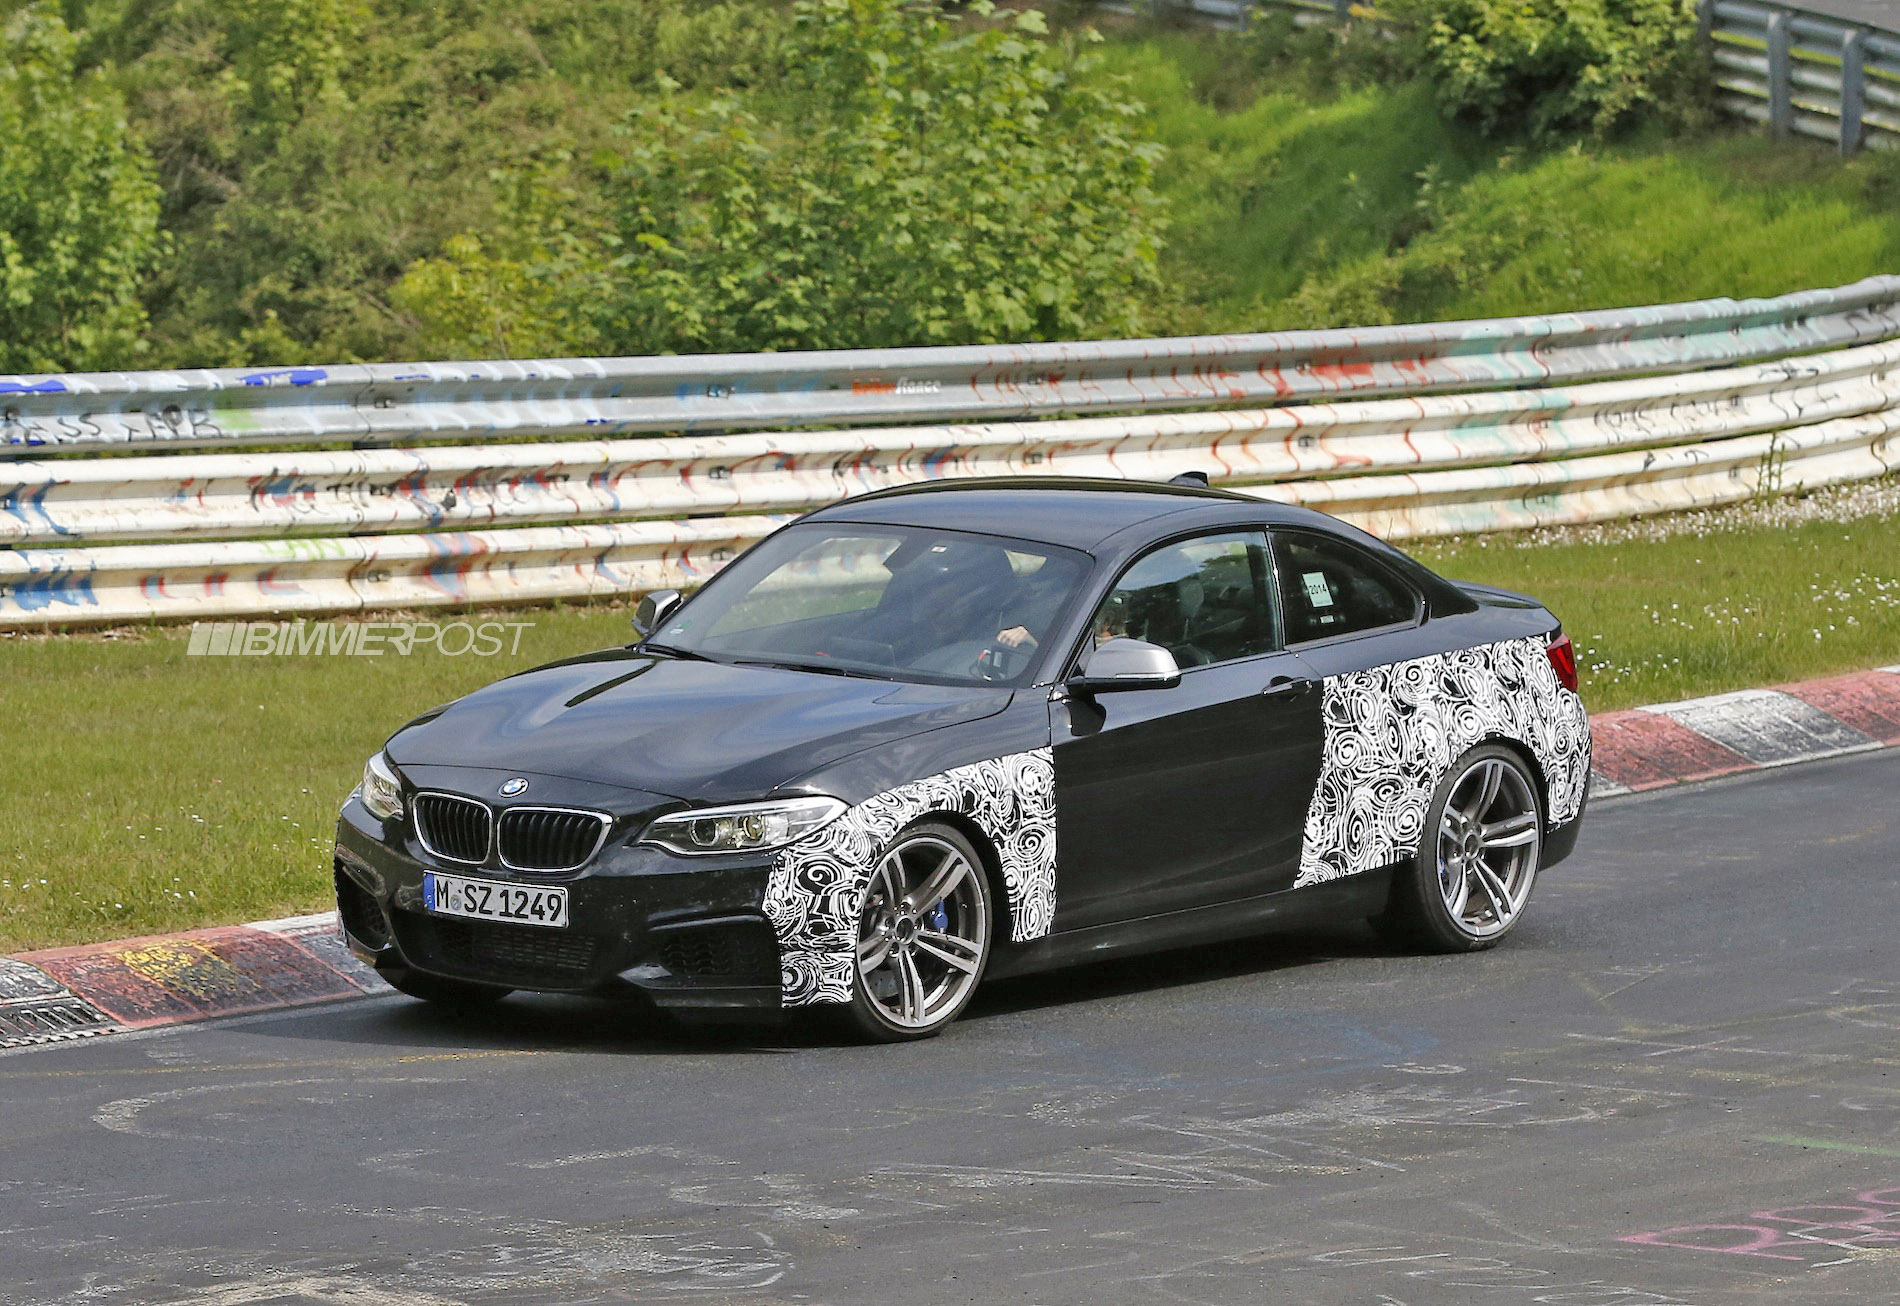 2016 - [BMW] M2 [F87] - Page 3 M2%20Ring%202